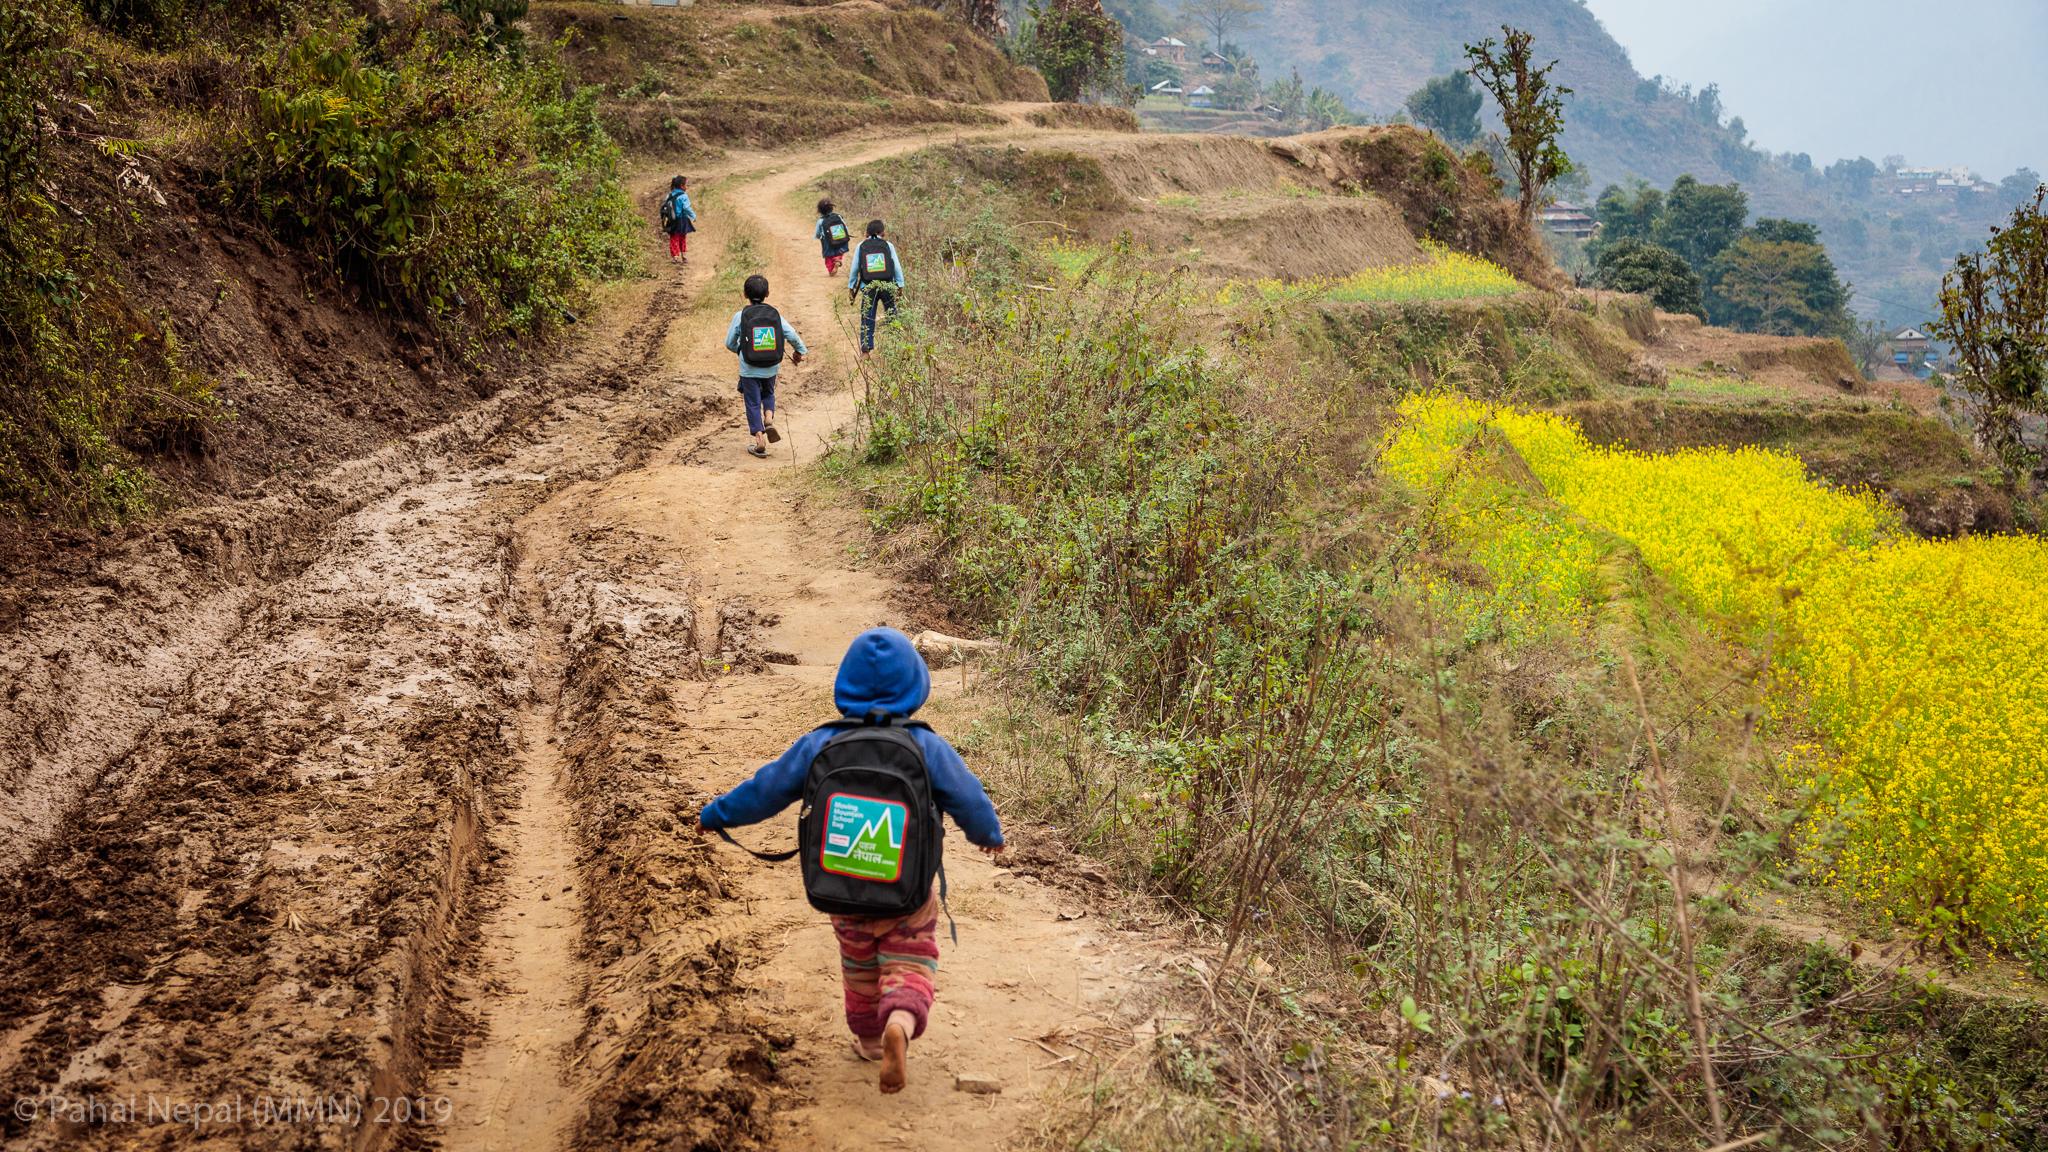 School children from Bhumistan basic school - Dadhing start their long walk home past bright yellow mustard fields.